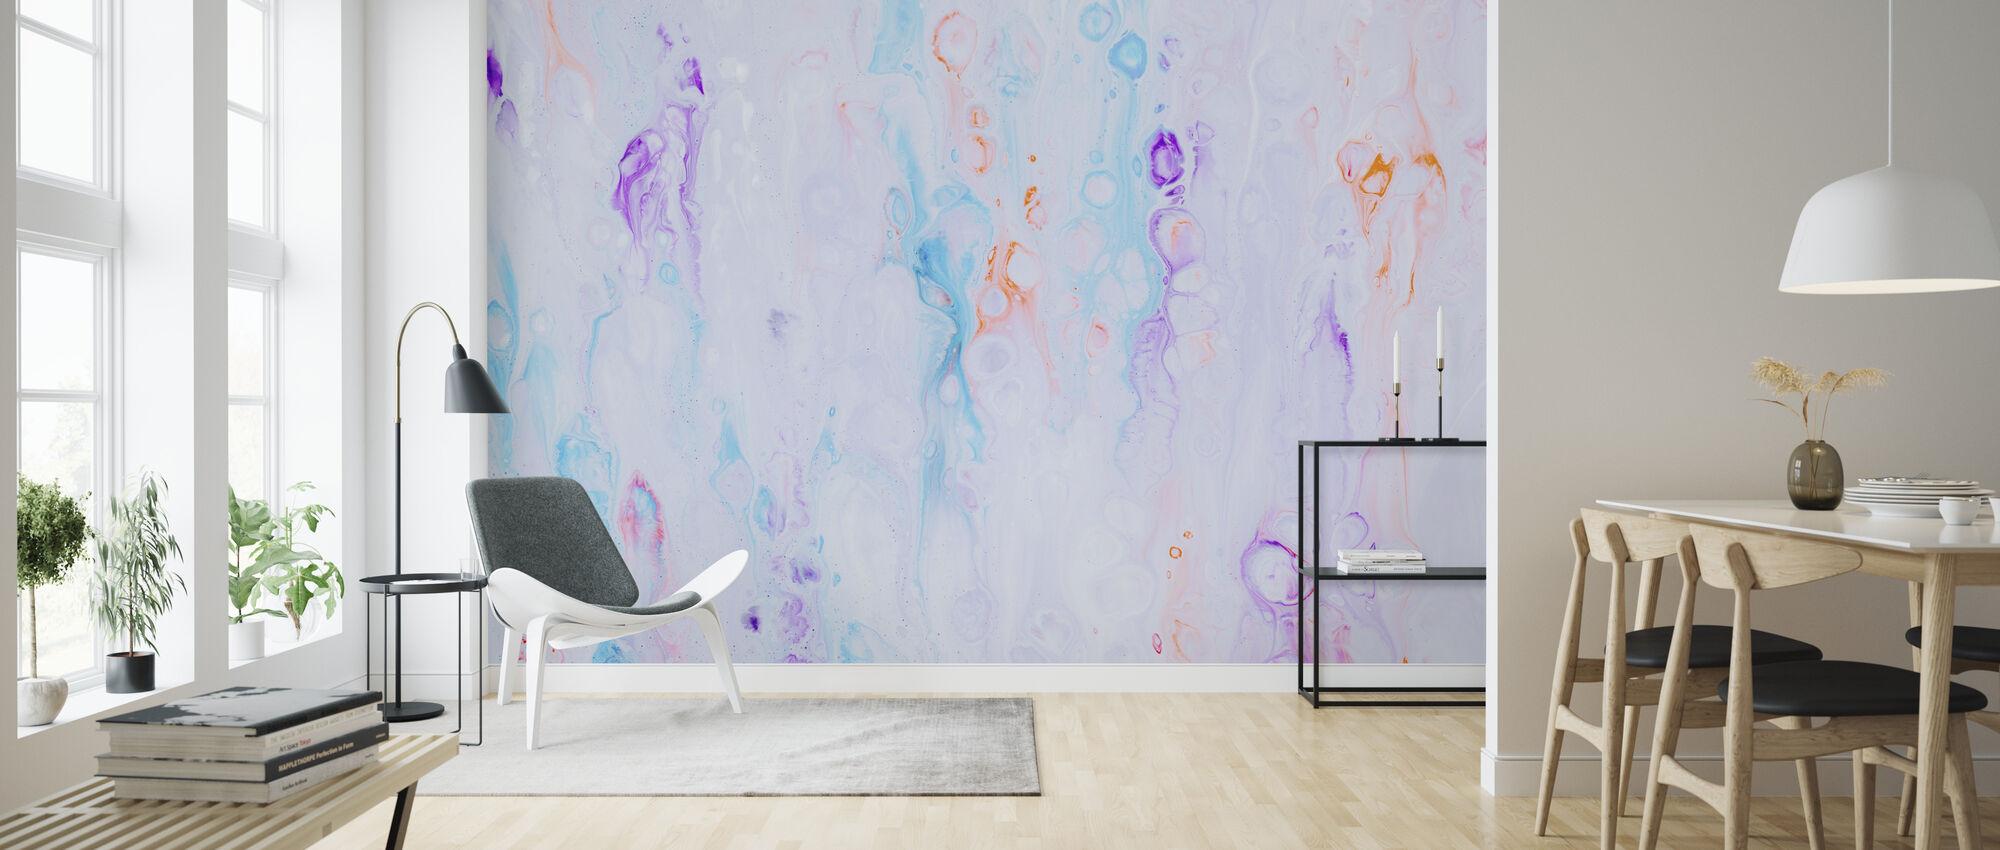 Colorful Art Canvas - Wallpaper - Living Room